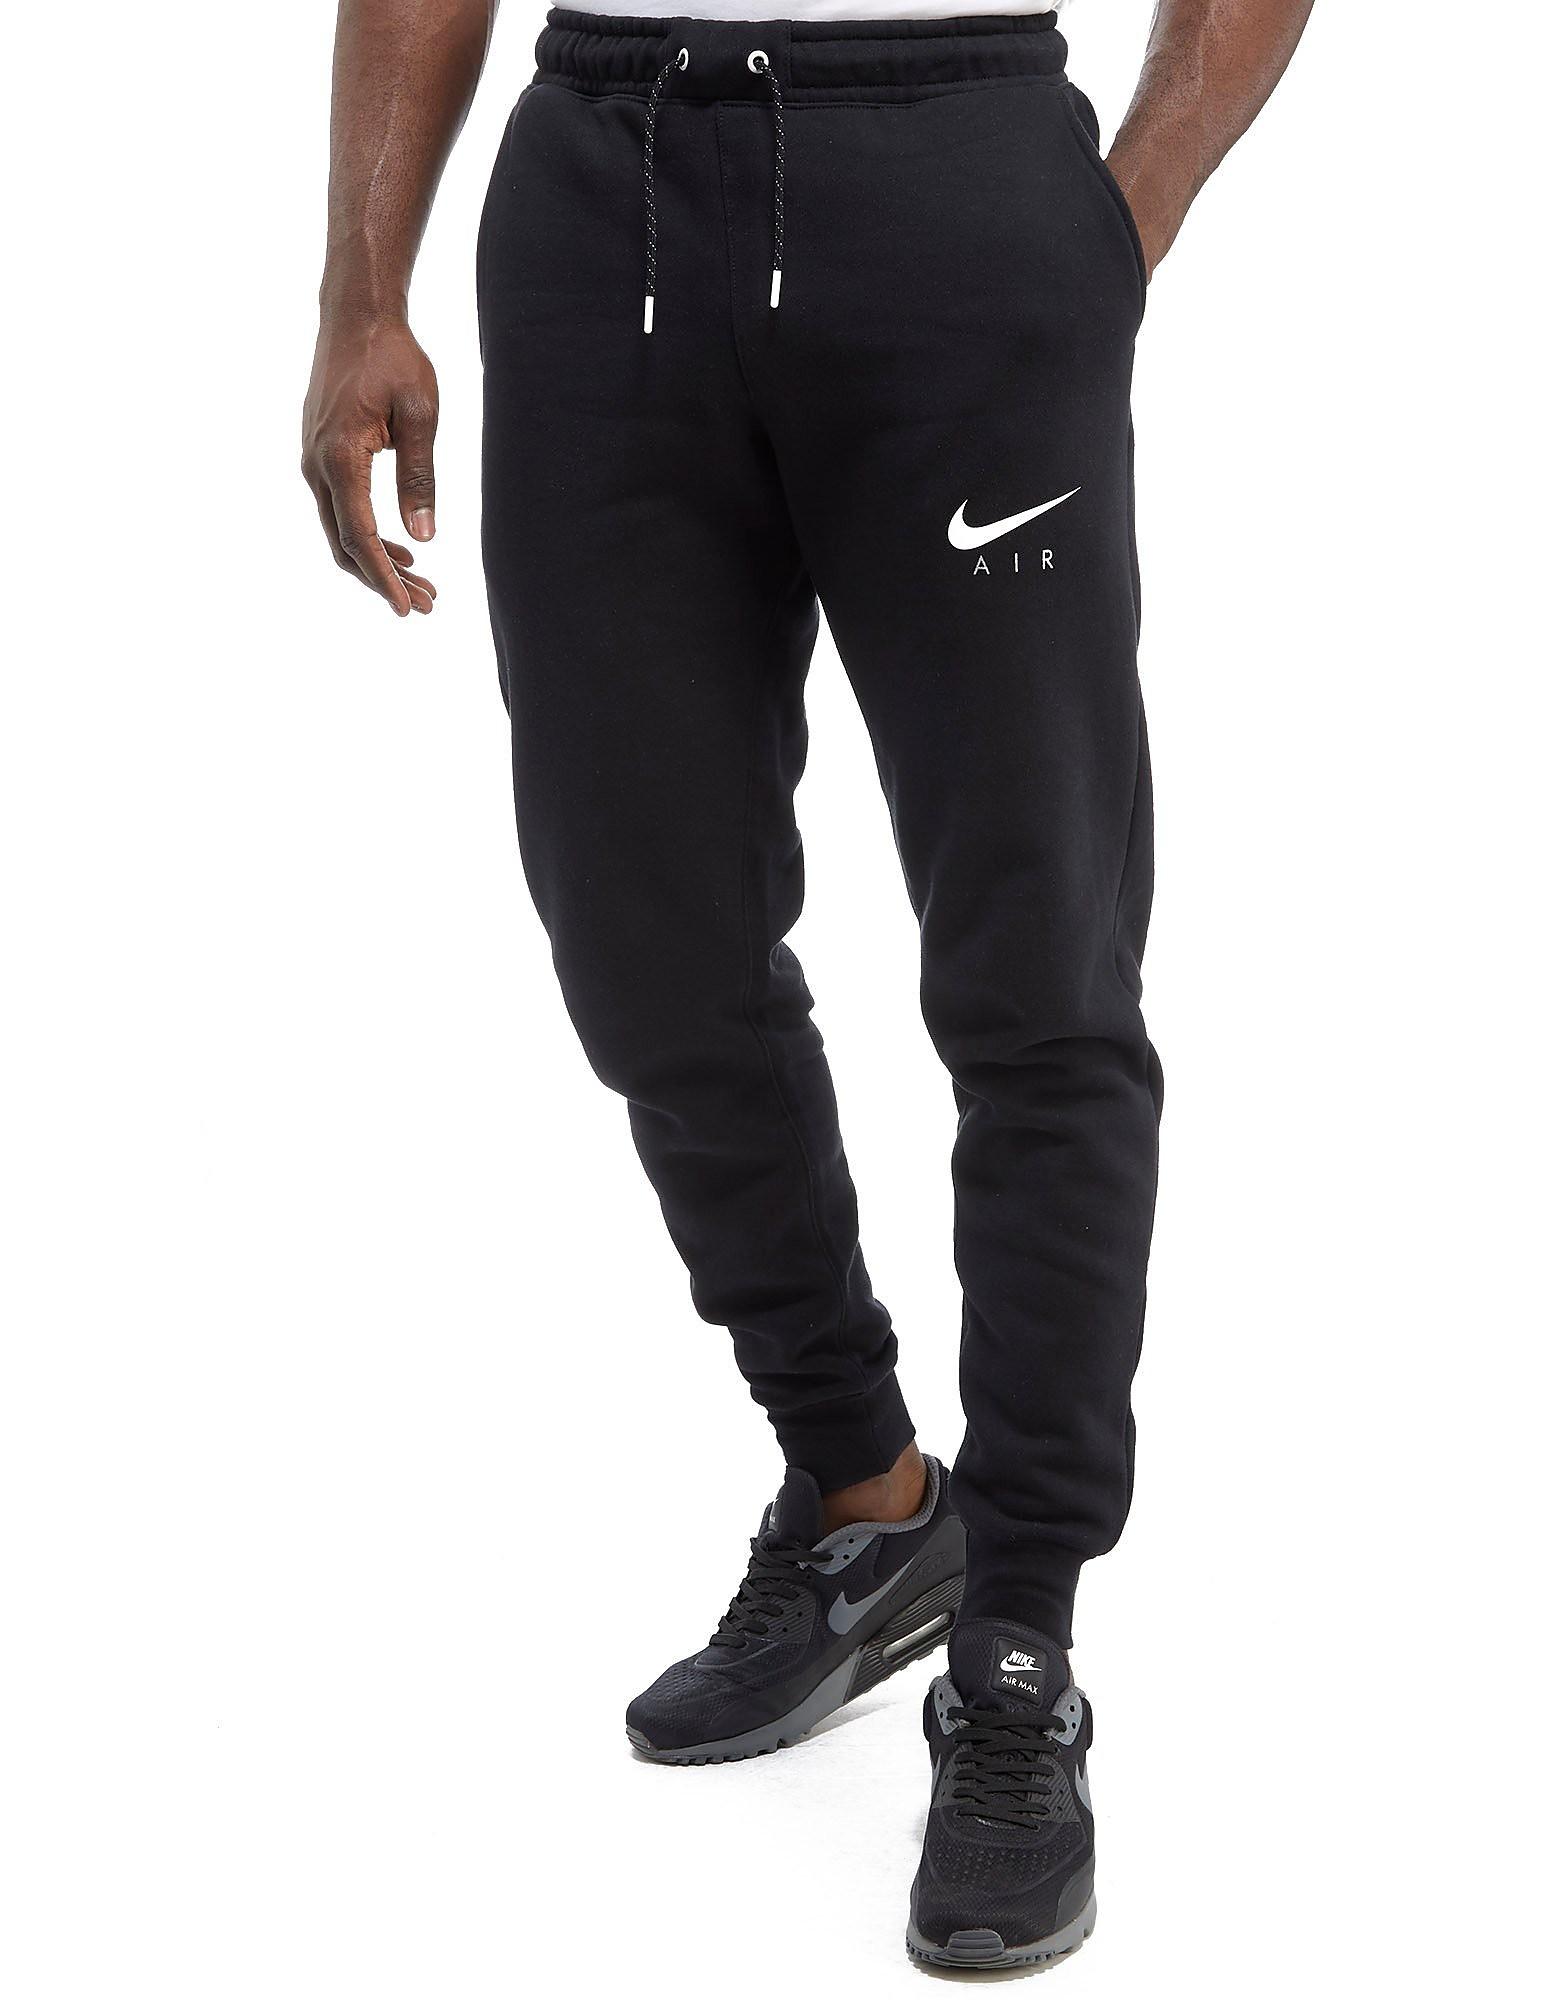 Nike Air Hybrid Jogginghose